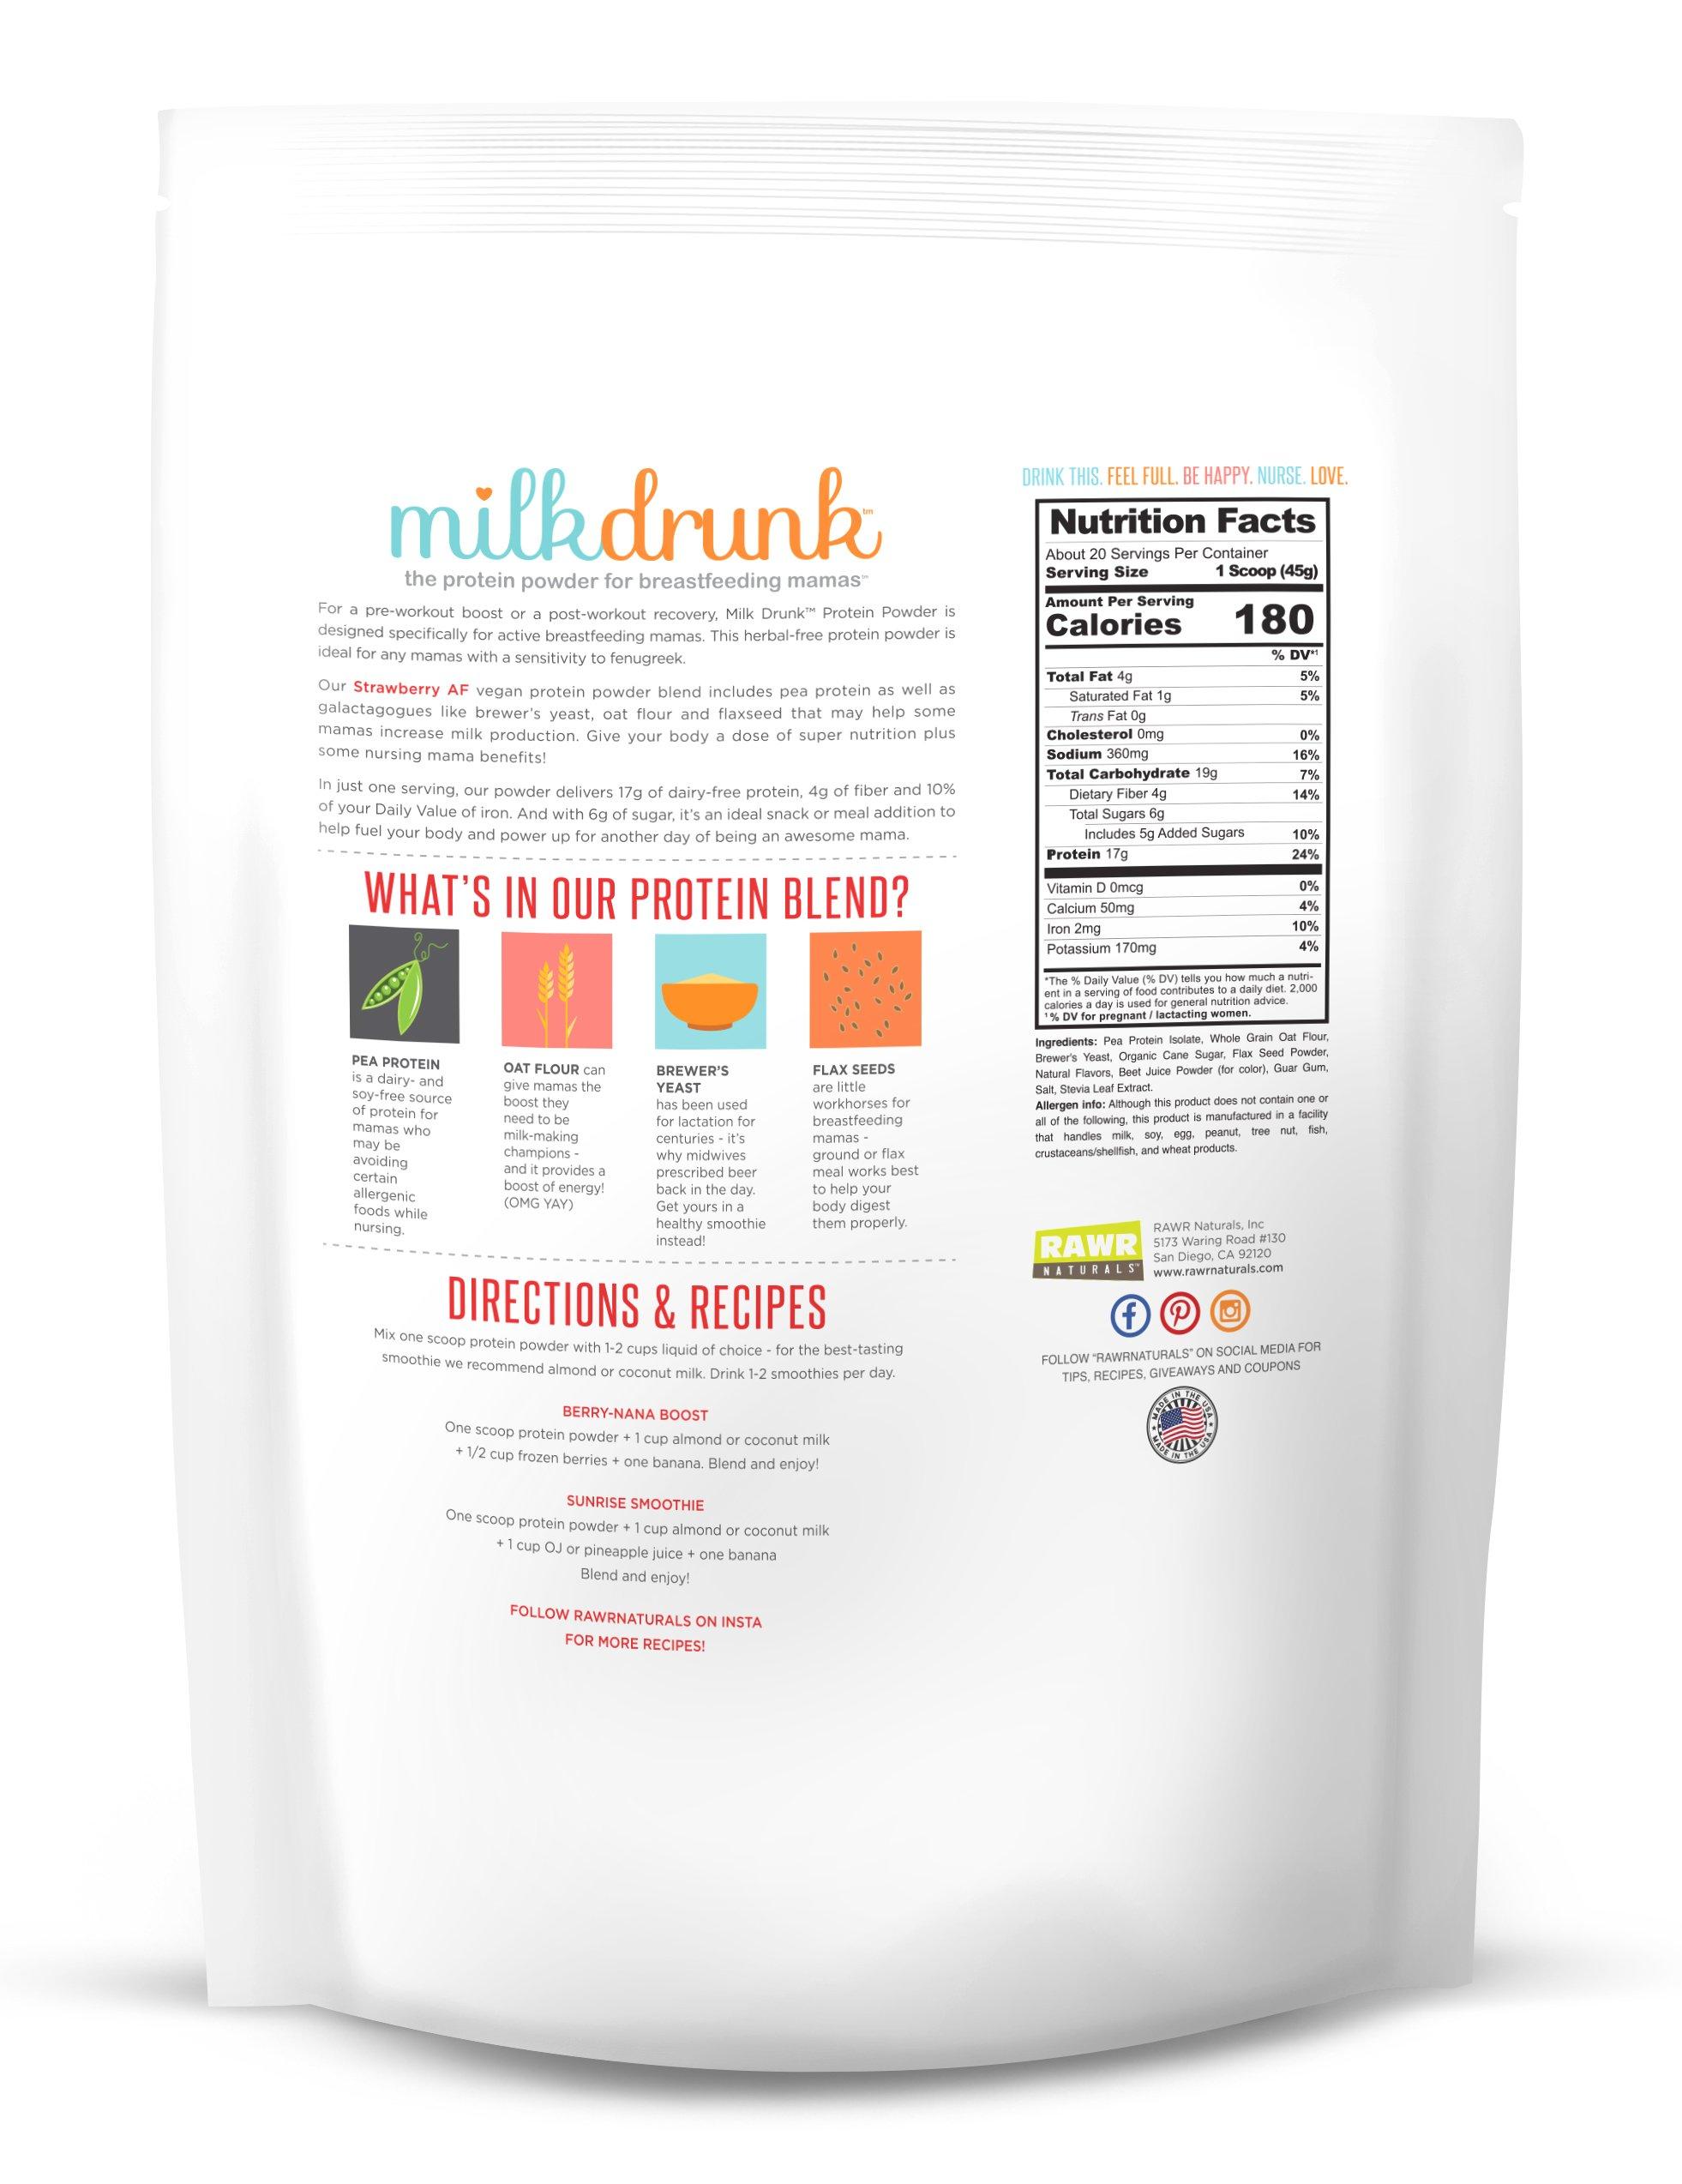 3 Bag Fenugreek-Free Variety Pack - Milk Drunk Protein Powder for Breastfeeding - 60 Servings Vegan Protein, Lactation-Boosting 17g Protein 4g Fiber 6g Sugar - Oat Flour, Flax, Brewer's Yeast by Milk Drunk (Image #6)